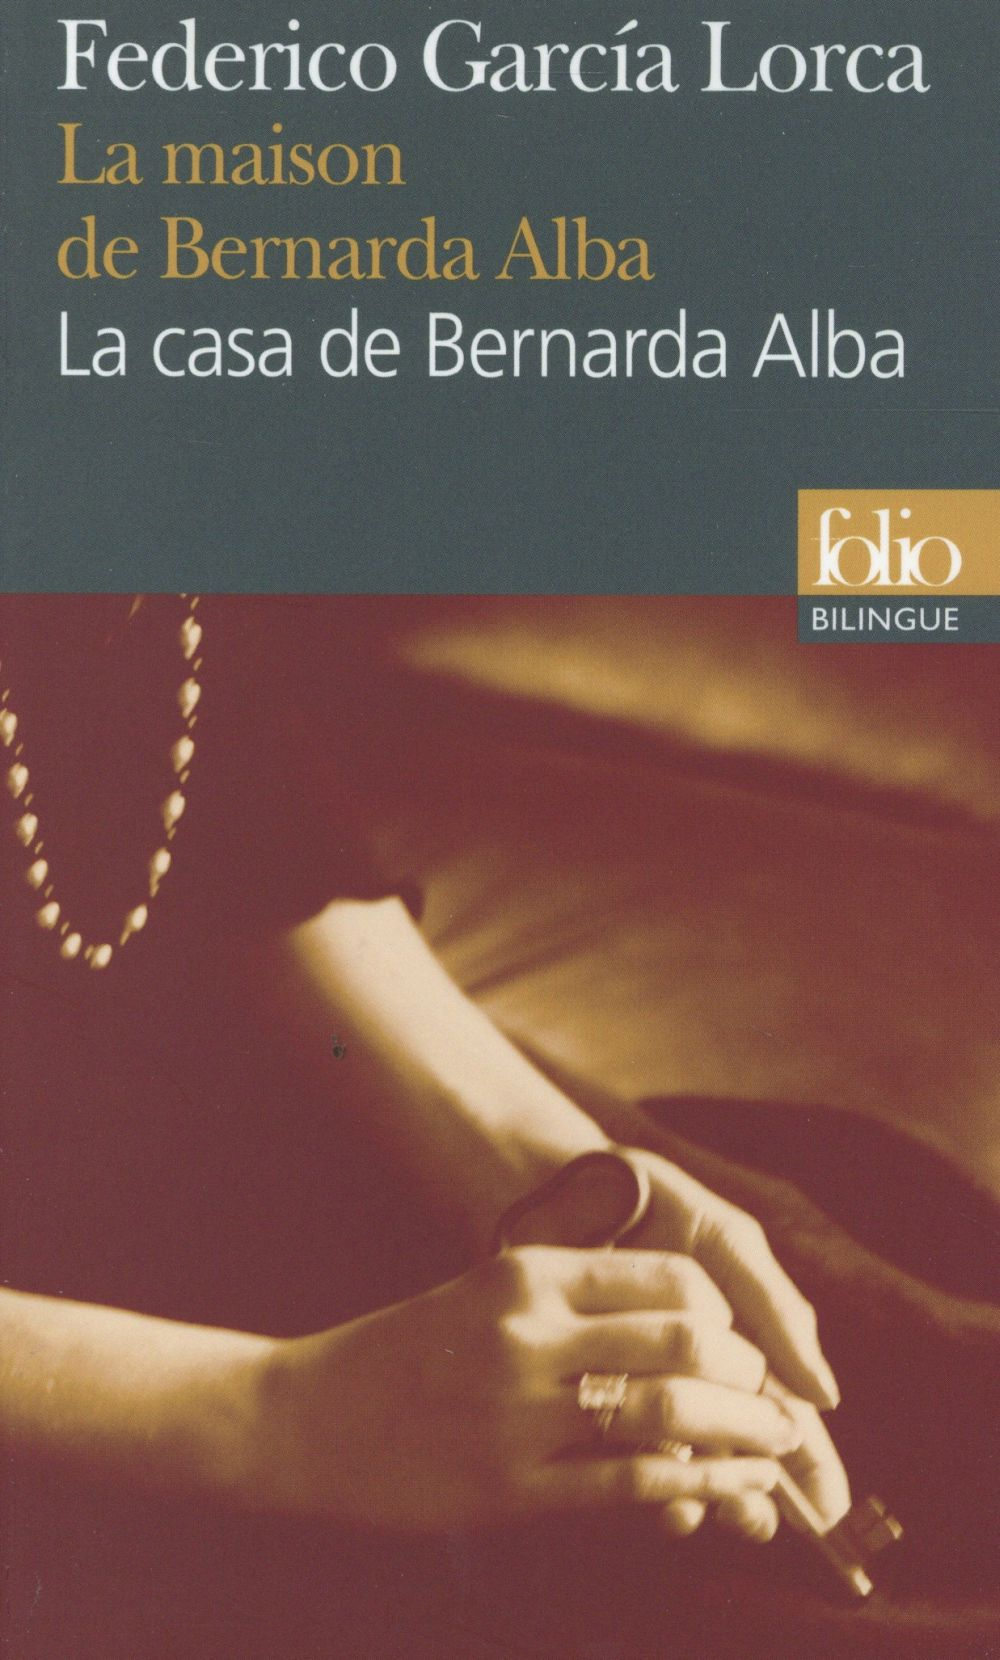 LA MAISON DE BERNARDA ALBALA CASA DE BERNARDA ALBA García Lorca Federico Gallimard